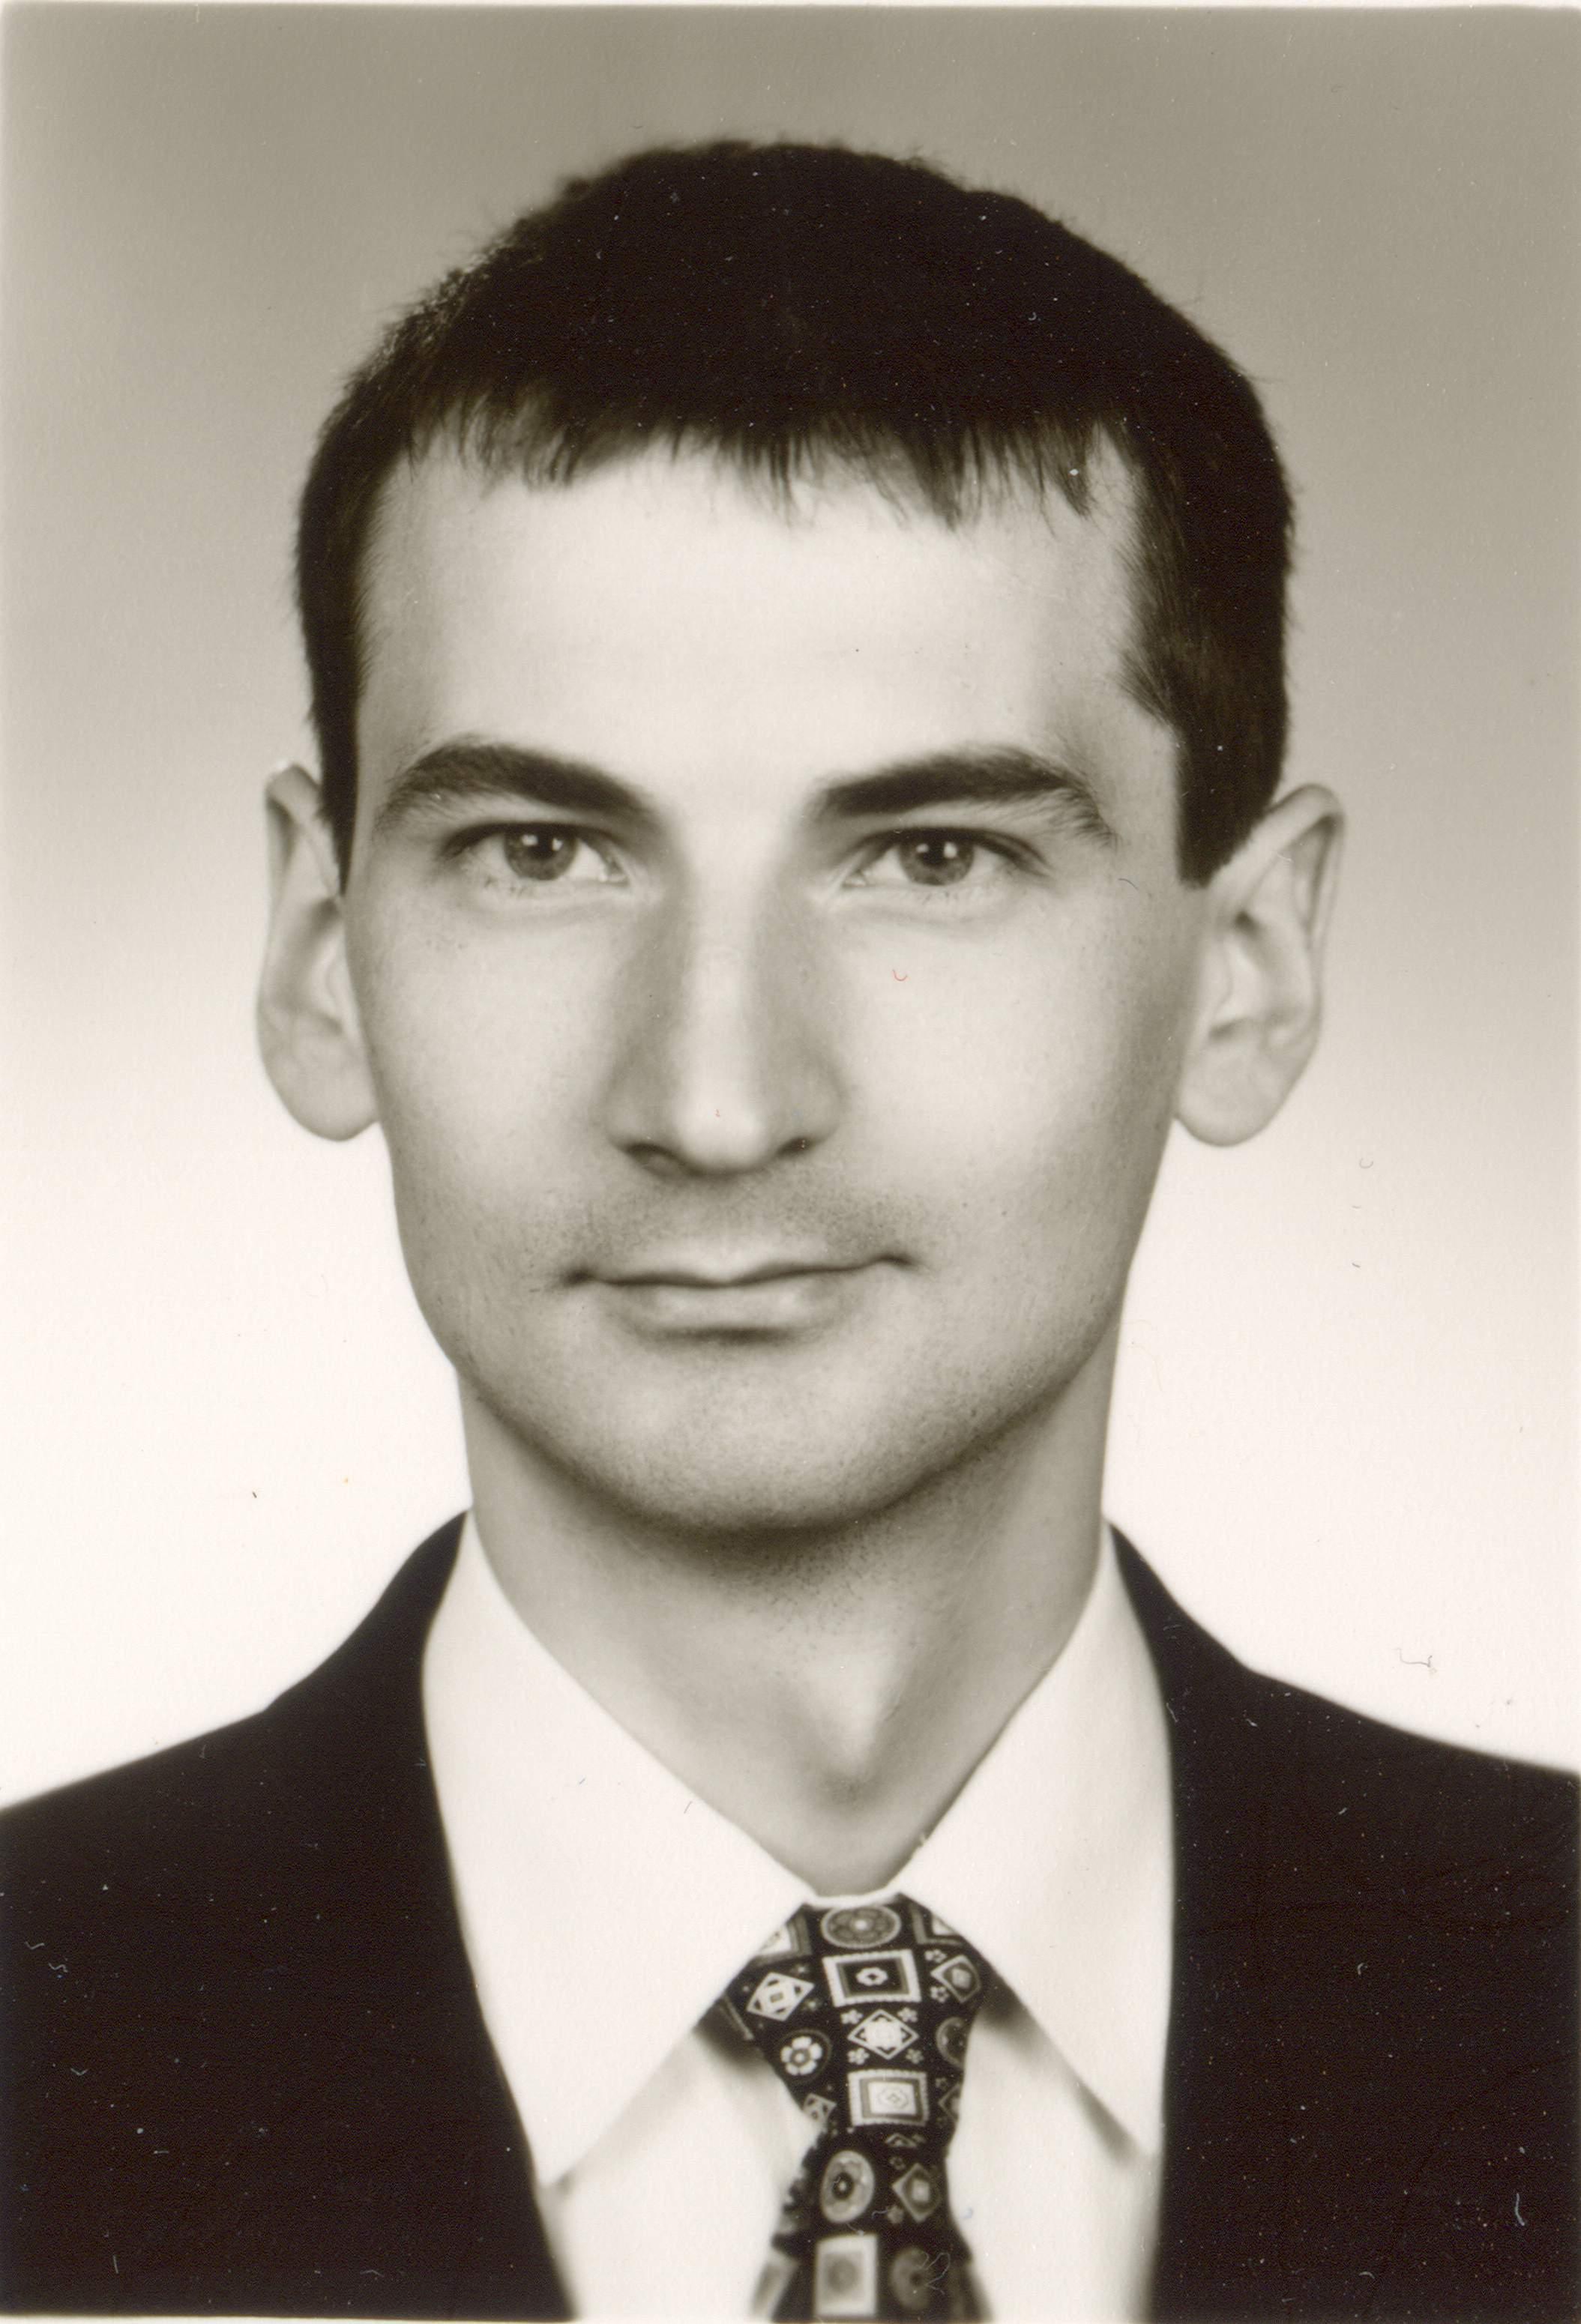 Tomasz Polec